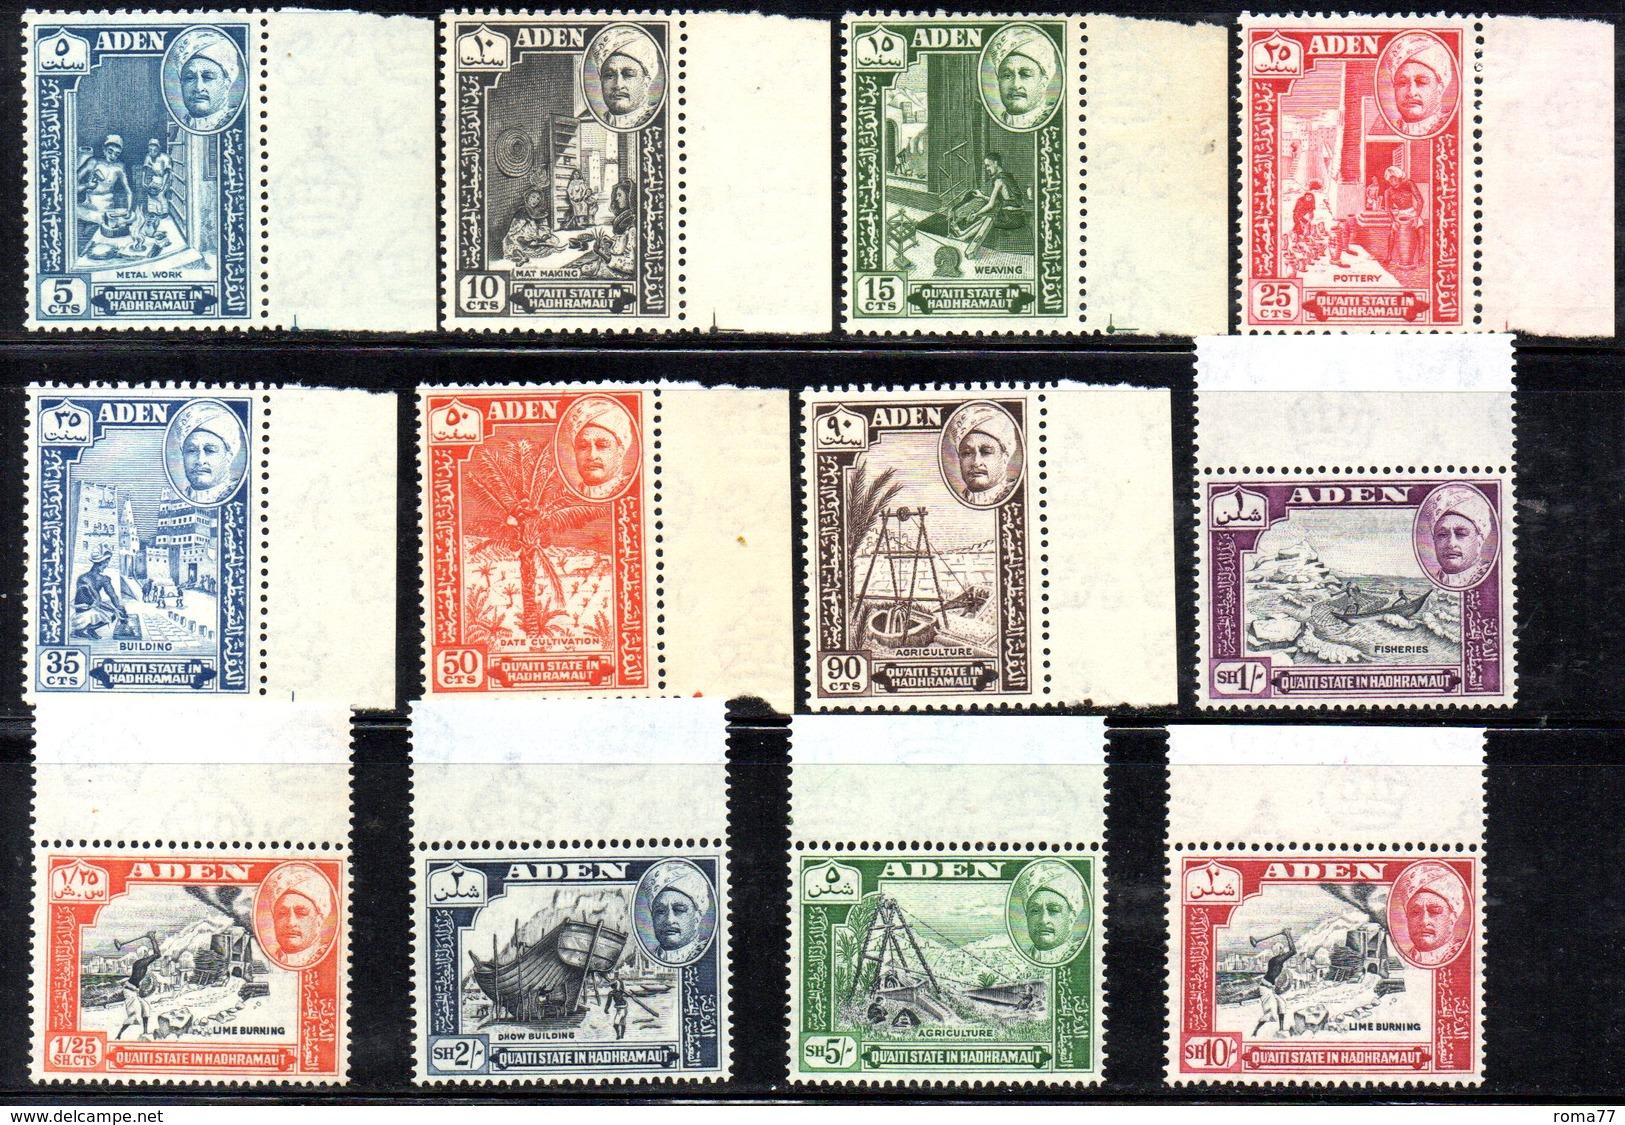 CI1020 - ADEN QUAITI STATE IN HADHRAMAUT 1955 , Serie Yvert N. 29/40  *** MNH (2380A) - Aden (1854-1963)